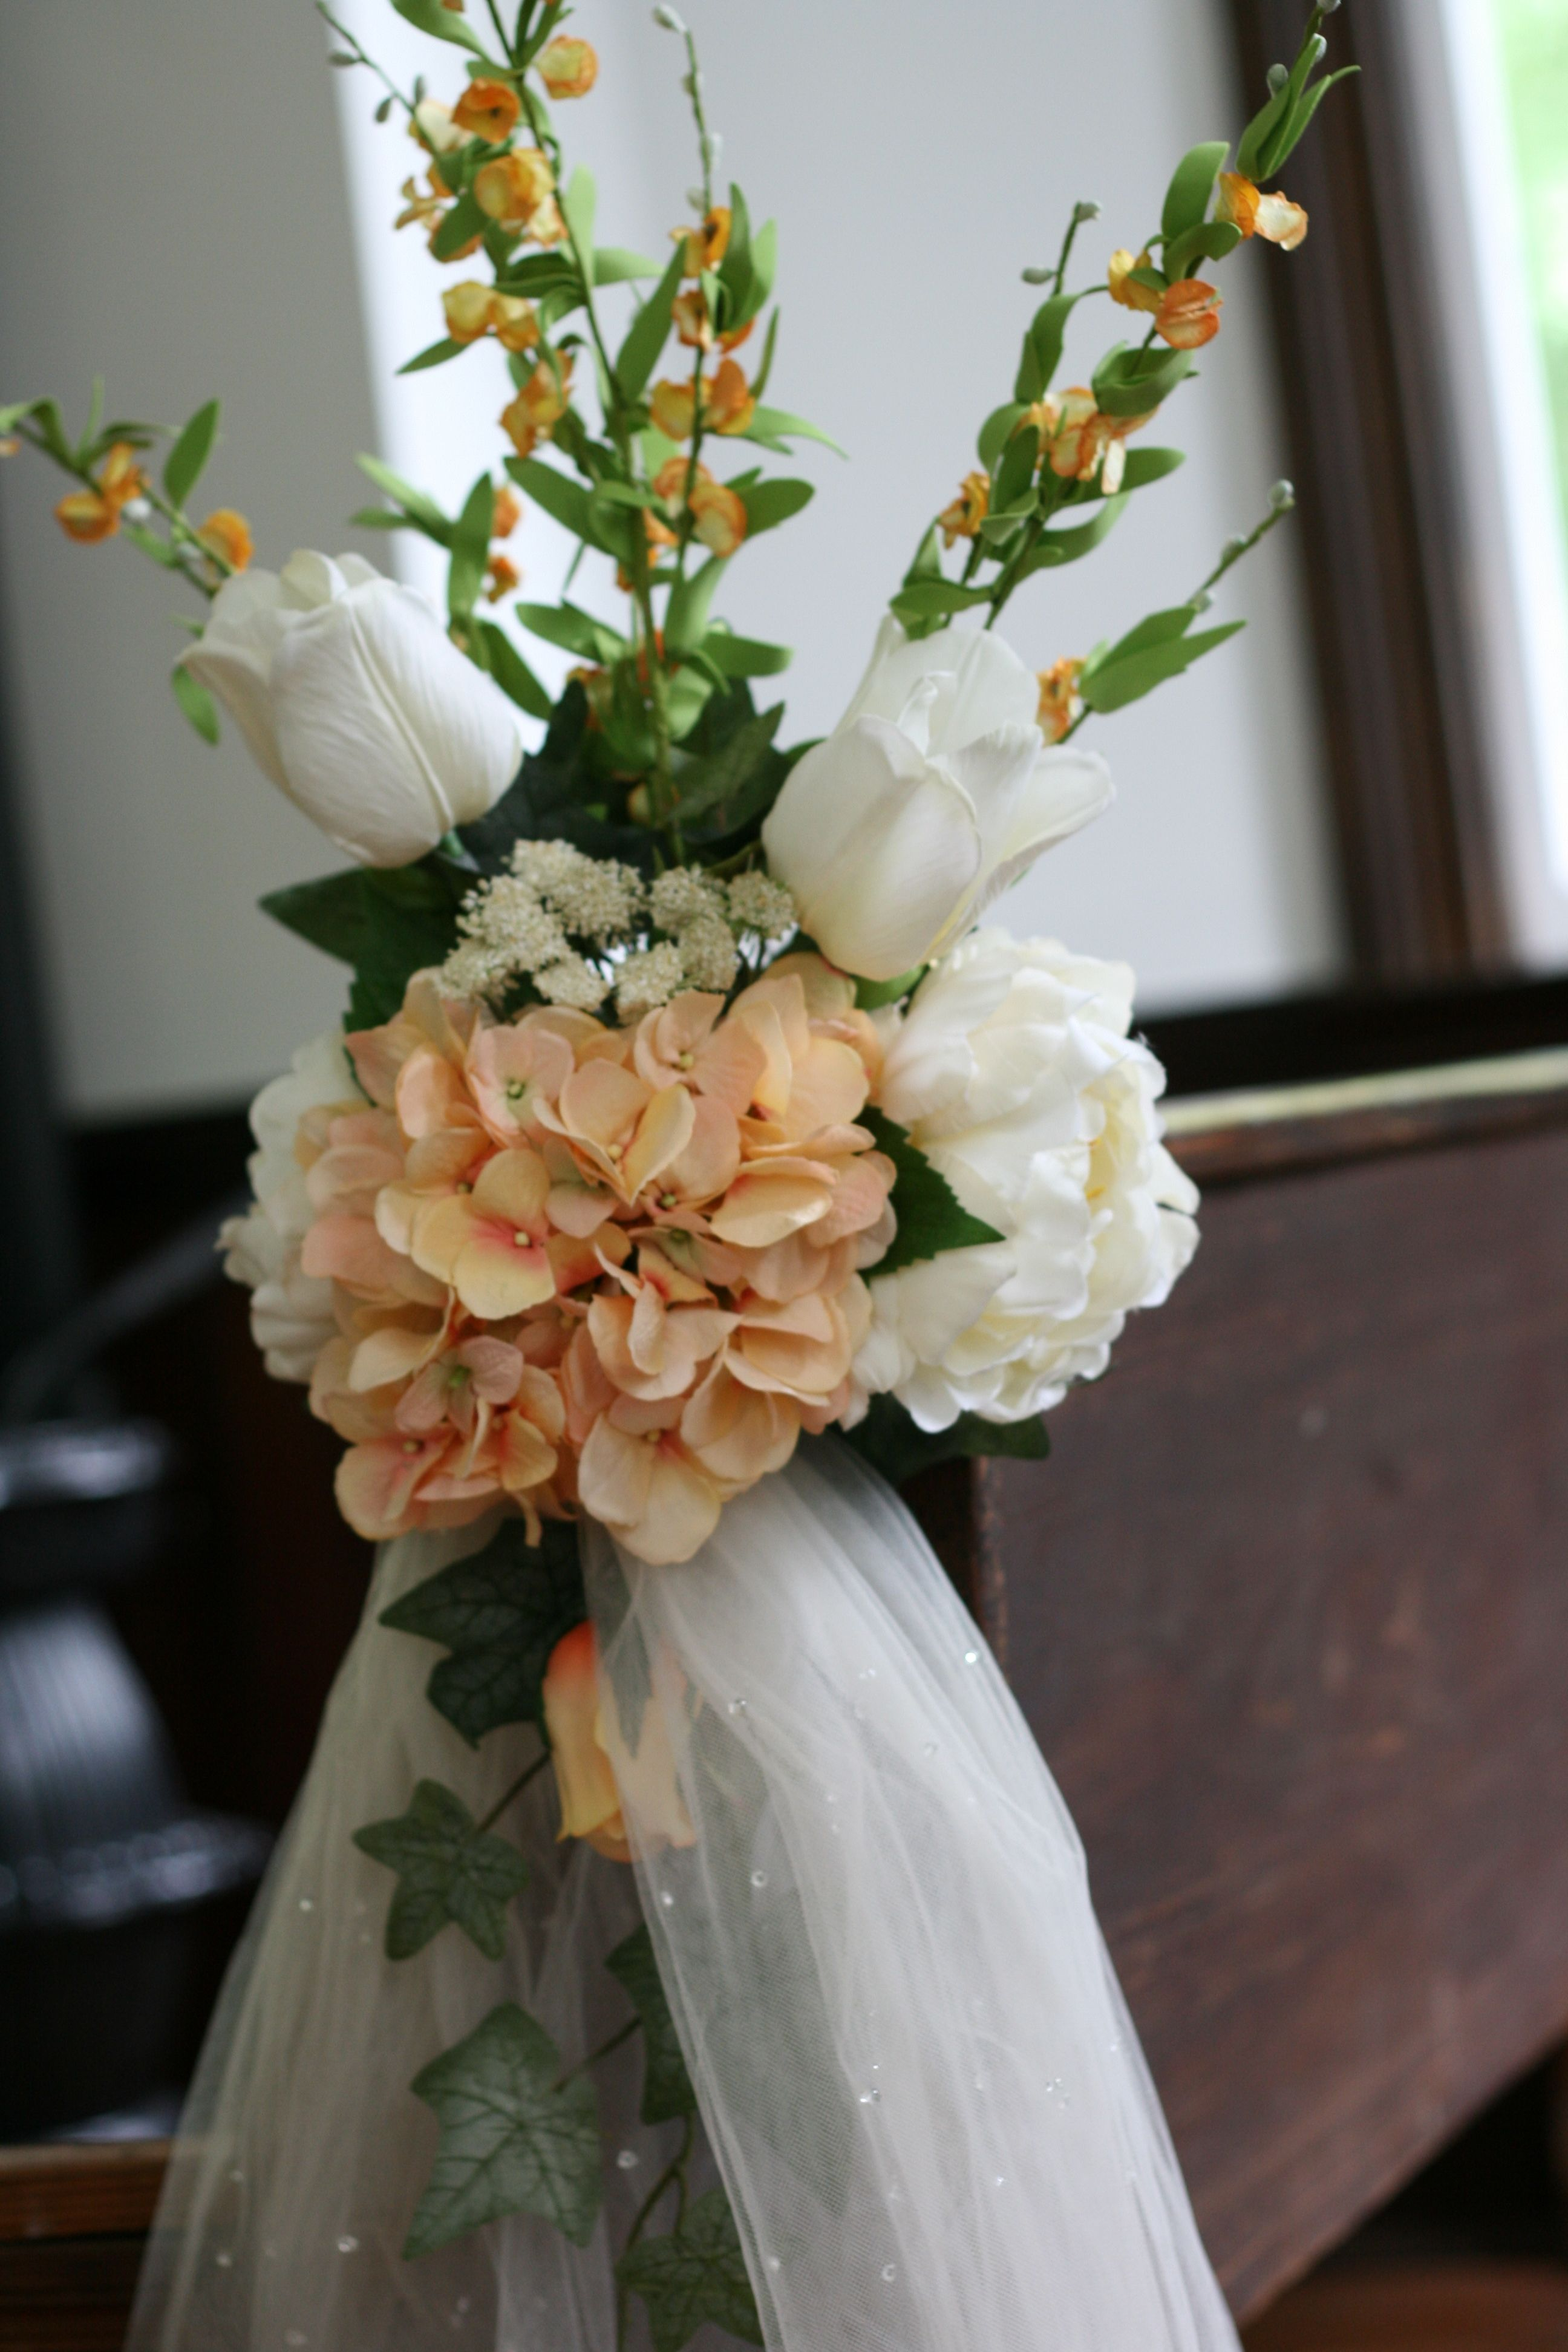 Church isle decorations using cream and orange silk flowers with